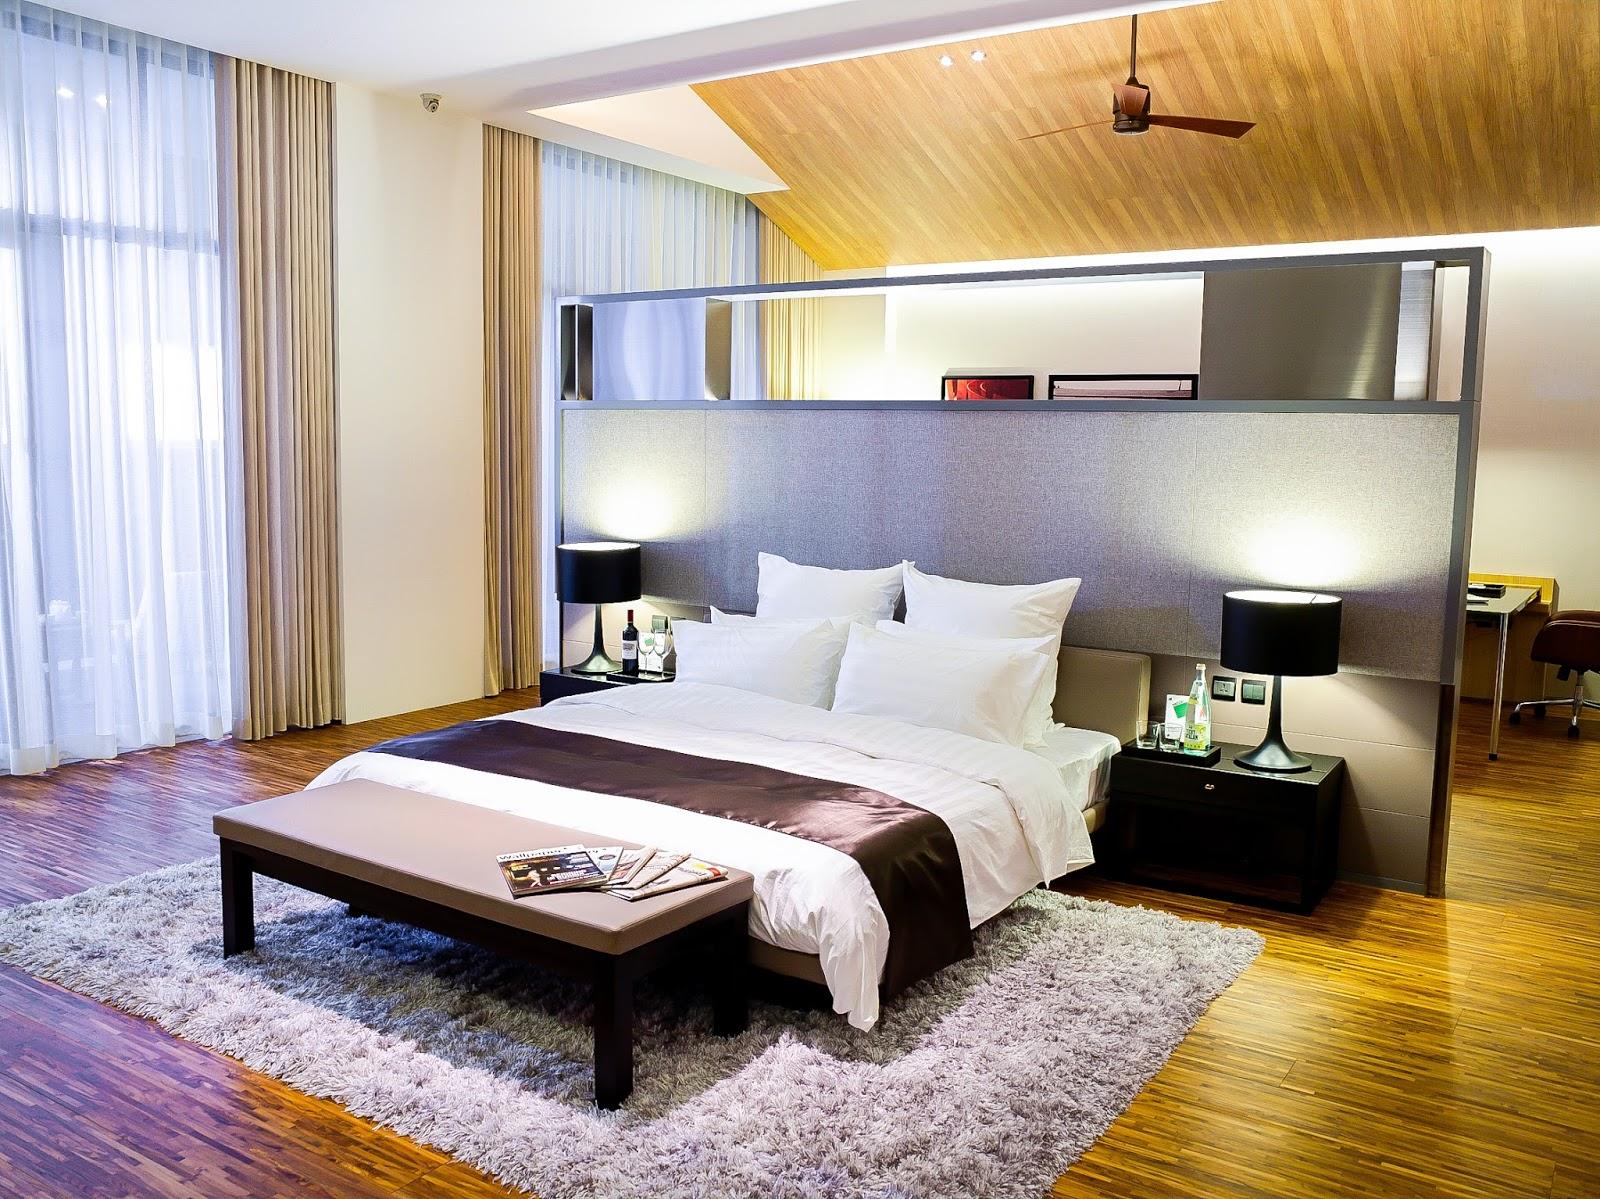 Gastronomy By Joy Midori Hotel And Casino A New 5 Star Hotel Set To Open At Clark Pampanga